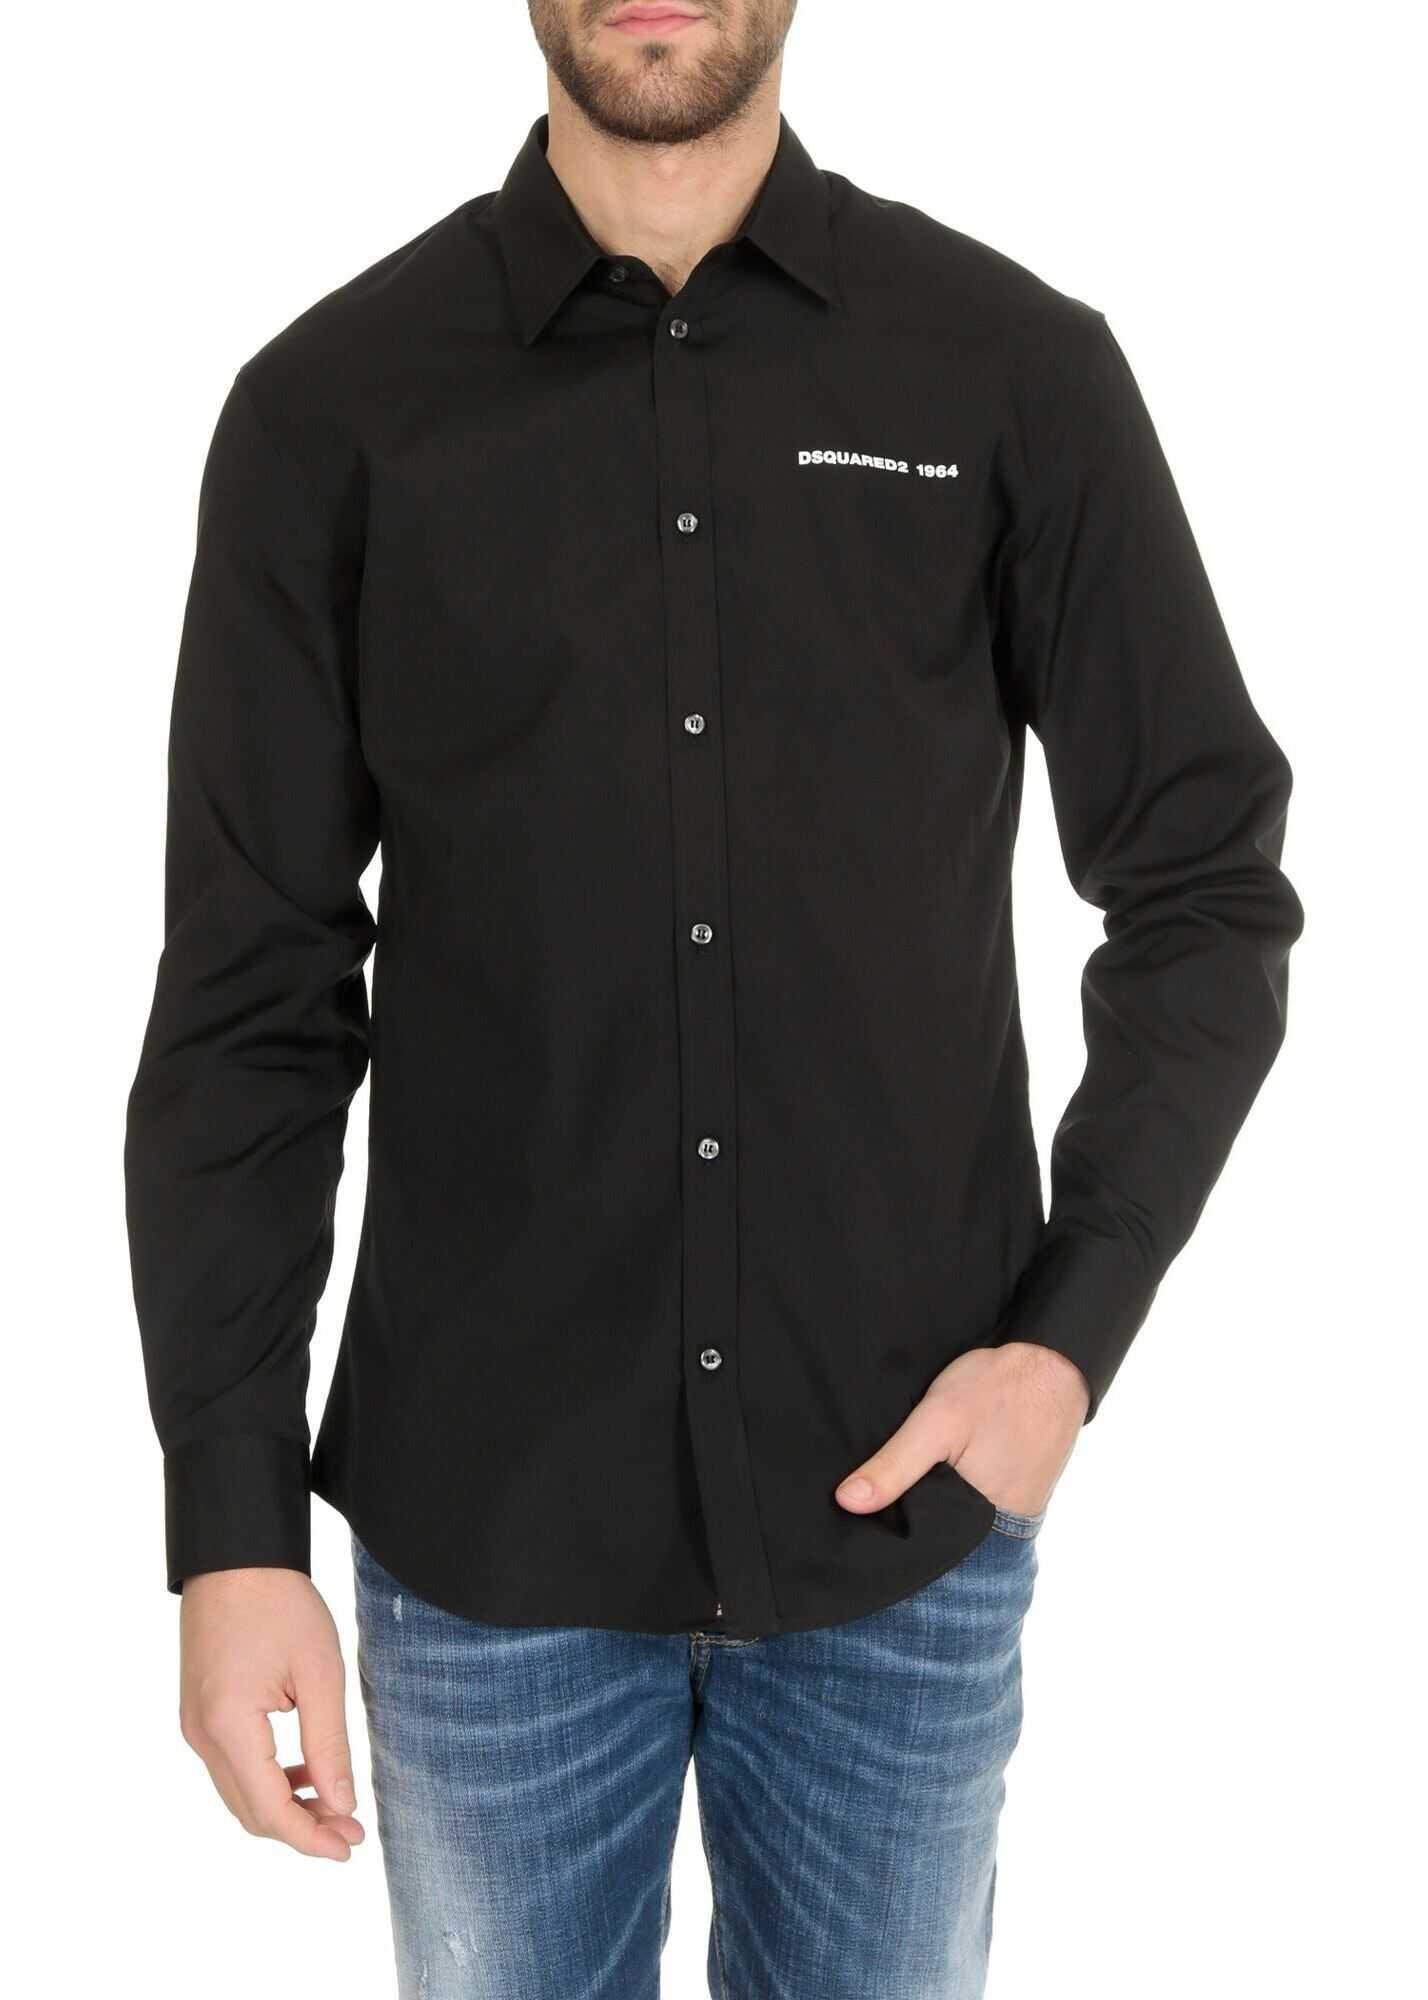 DSQUARED2 Poplin Relax Dan Shirt In Black Black